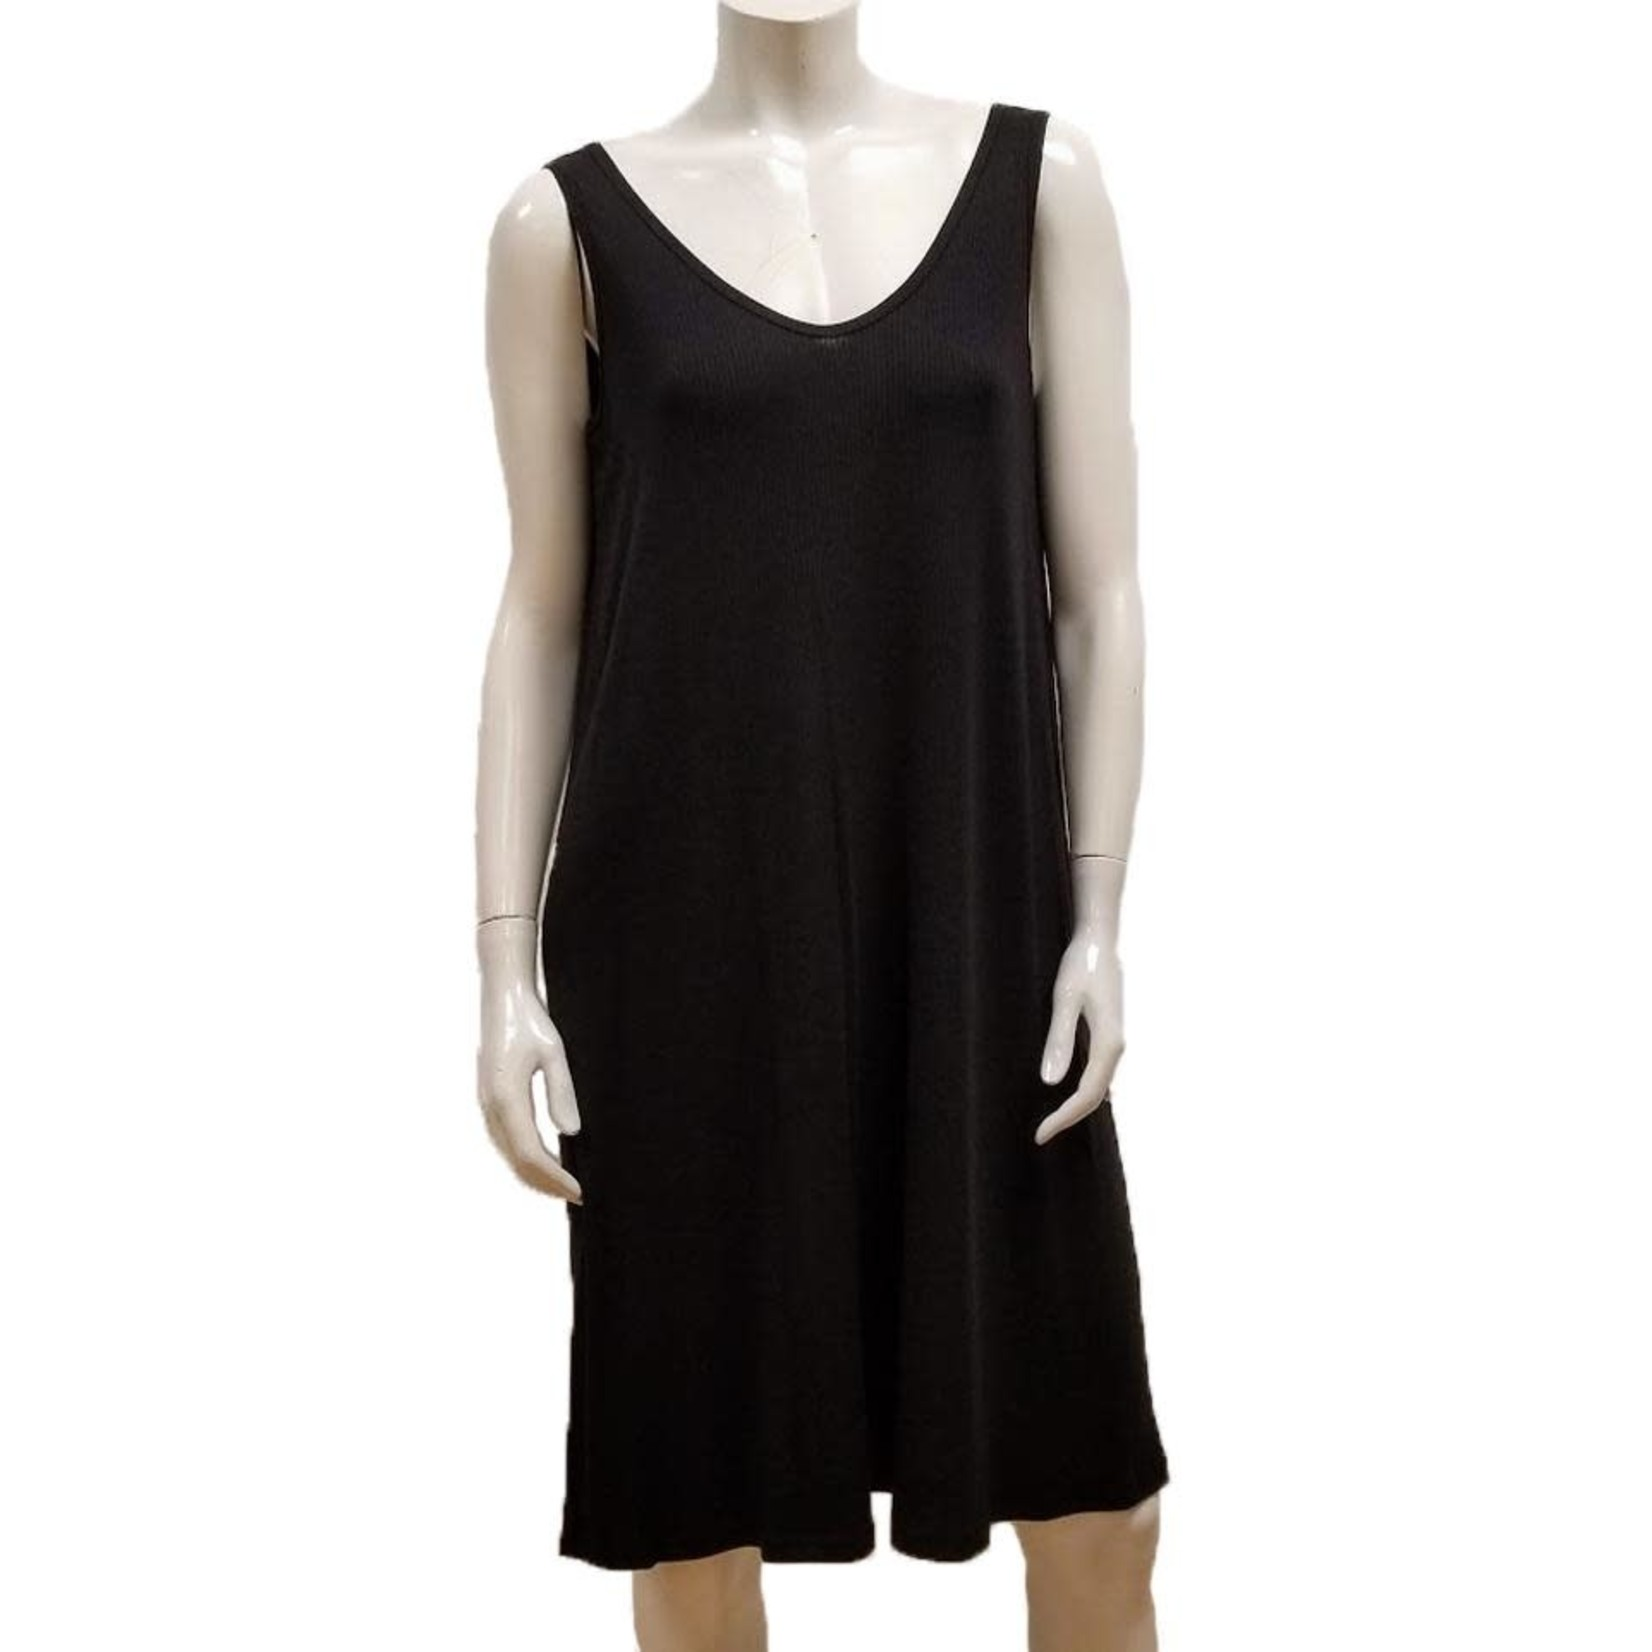 Gilmour Modal Rib Knit Tank Dress